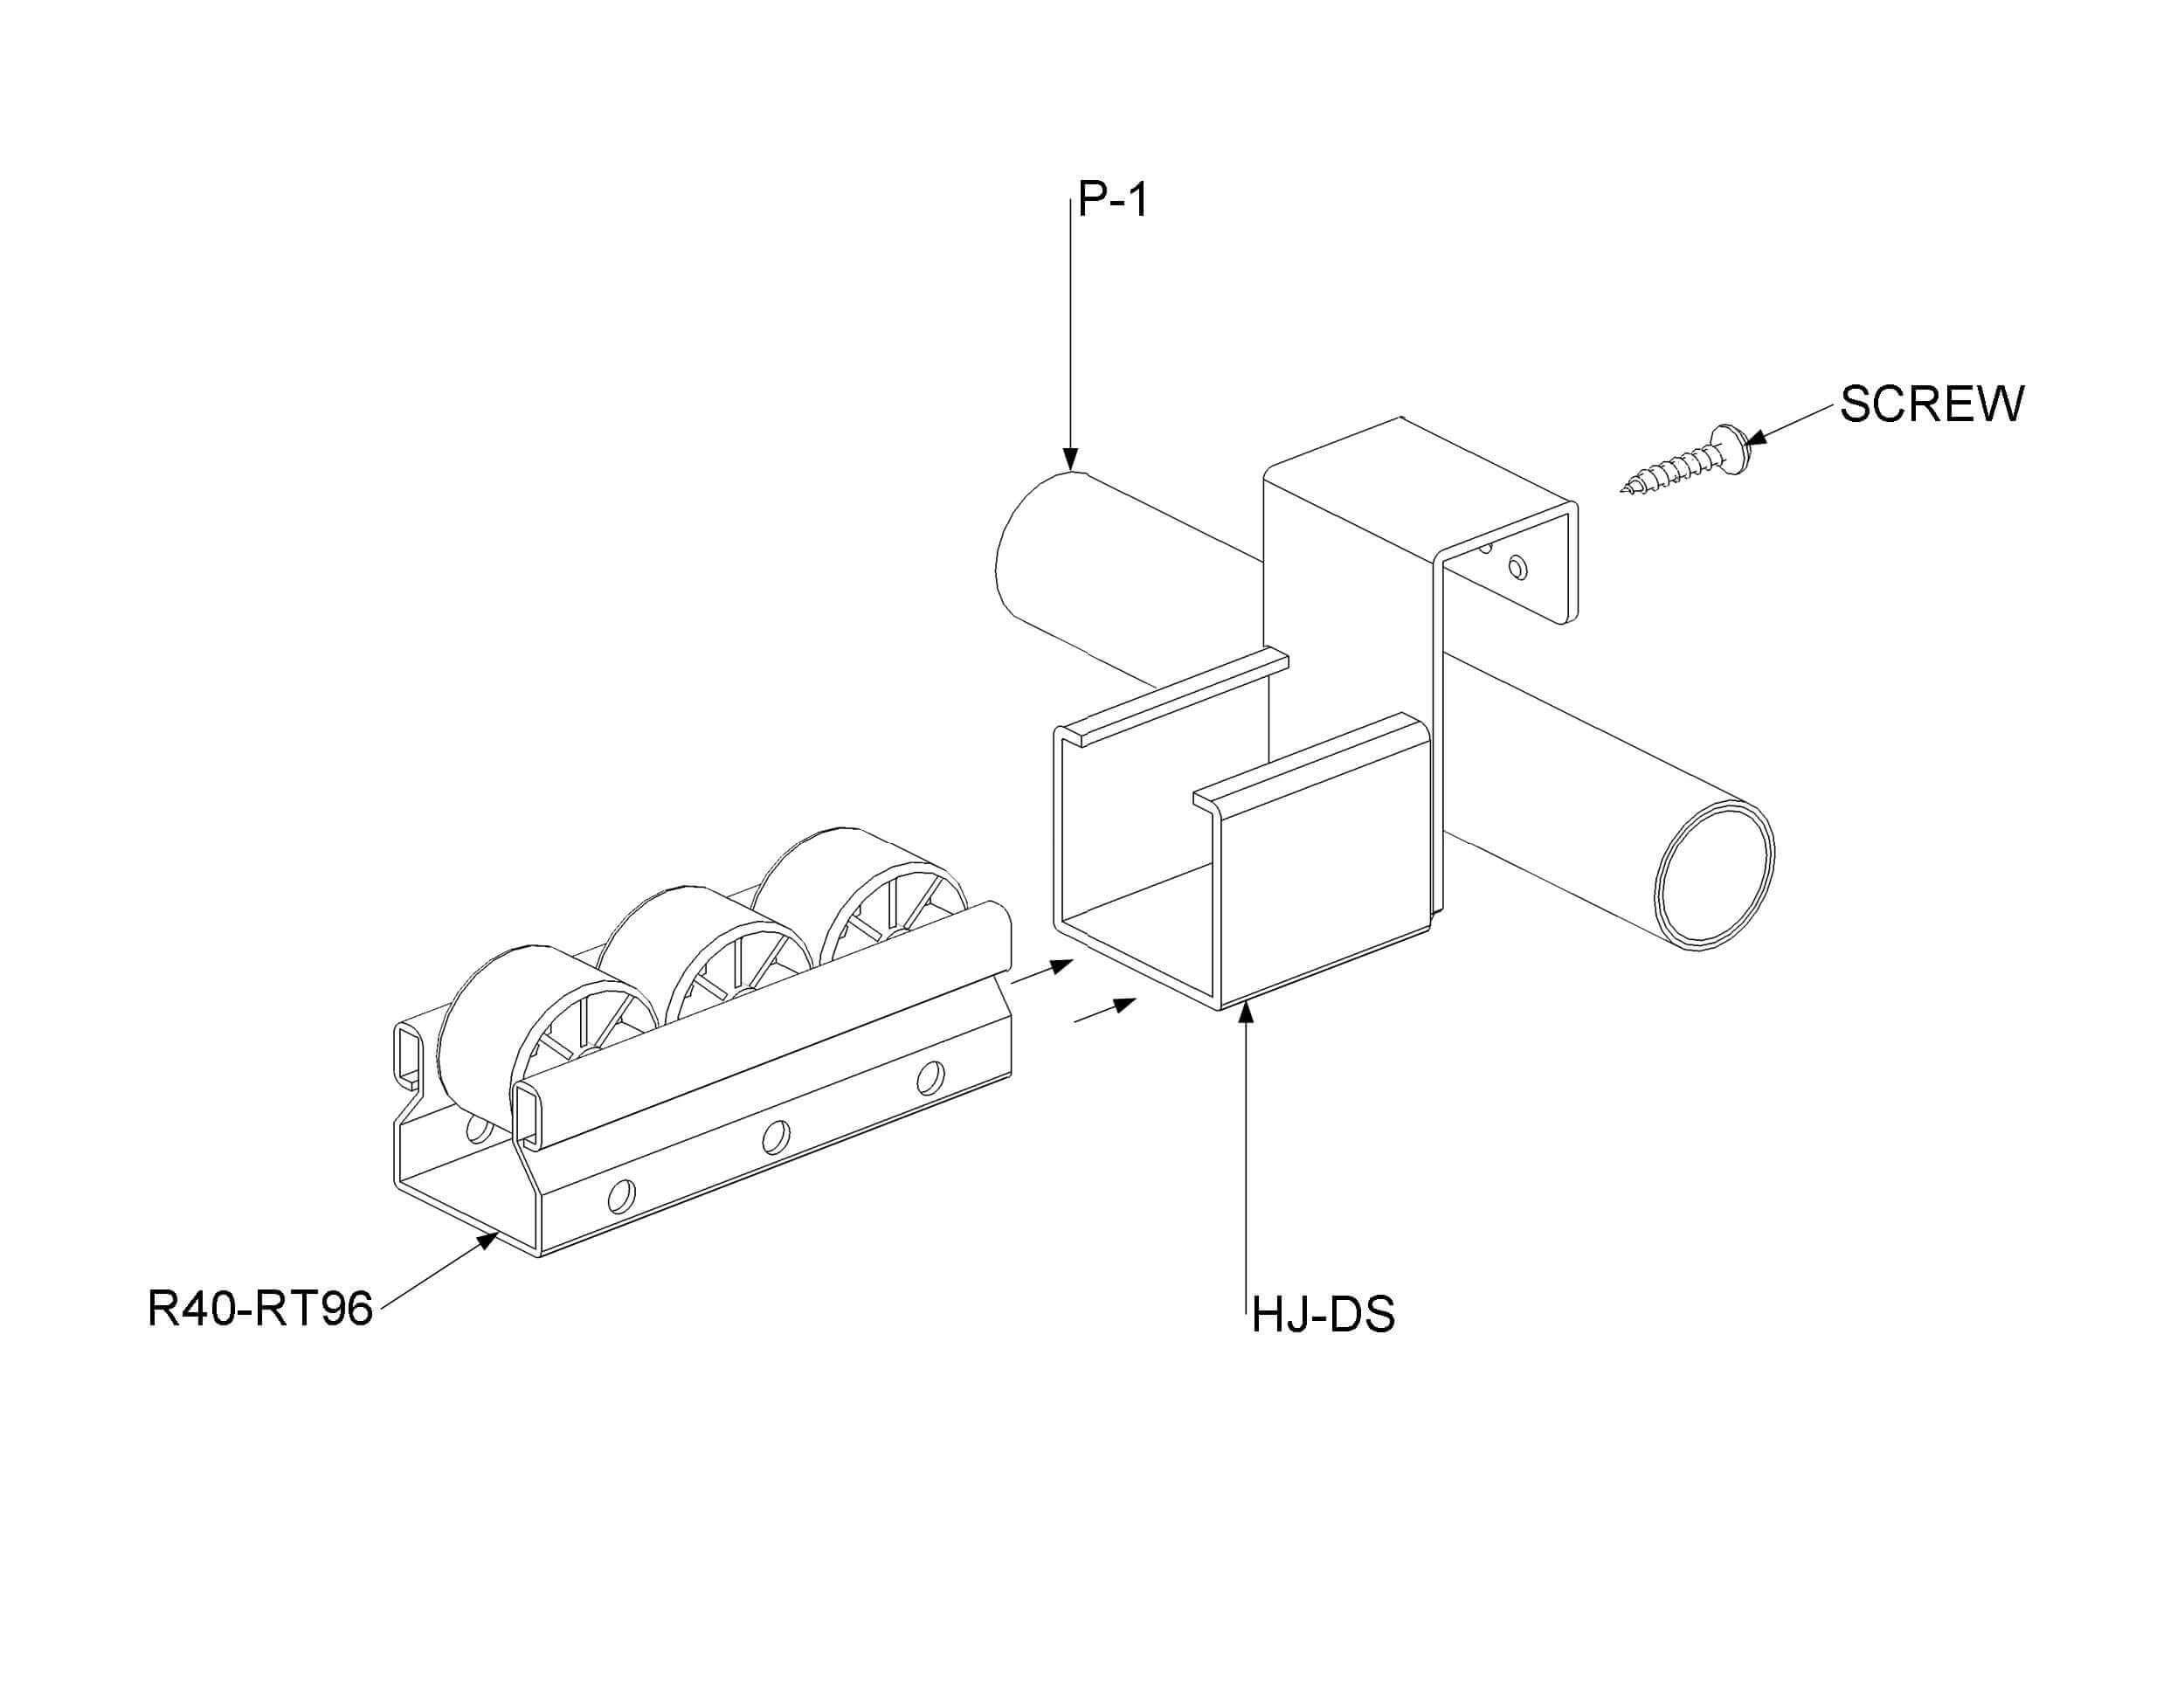 Metal Drop Stop Conveyor Mount For Conveyor Ending Point